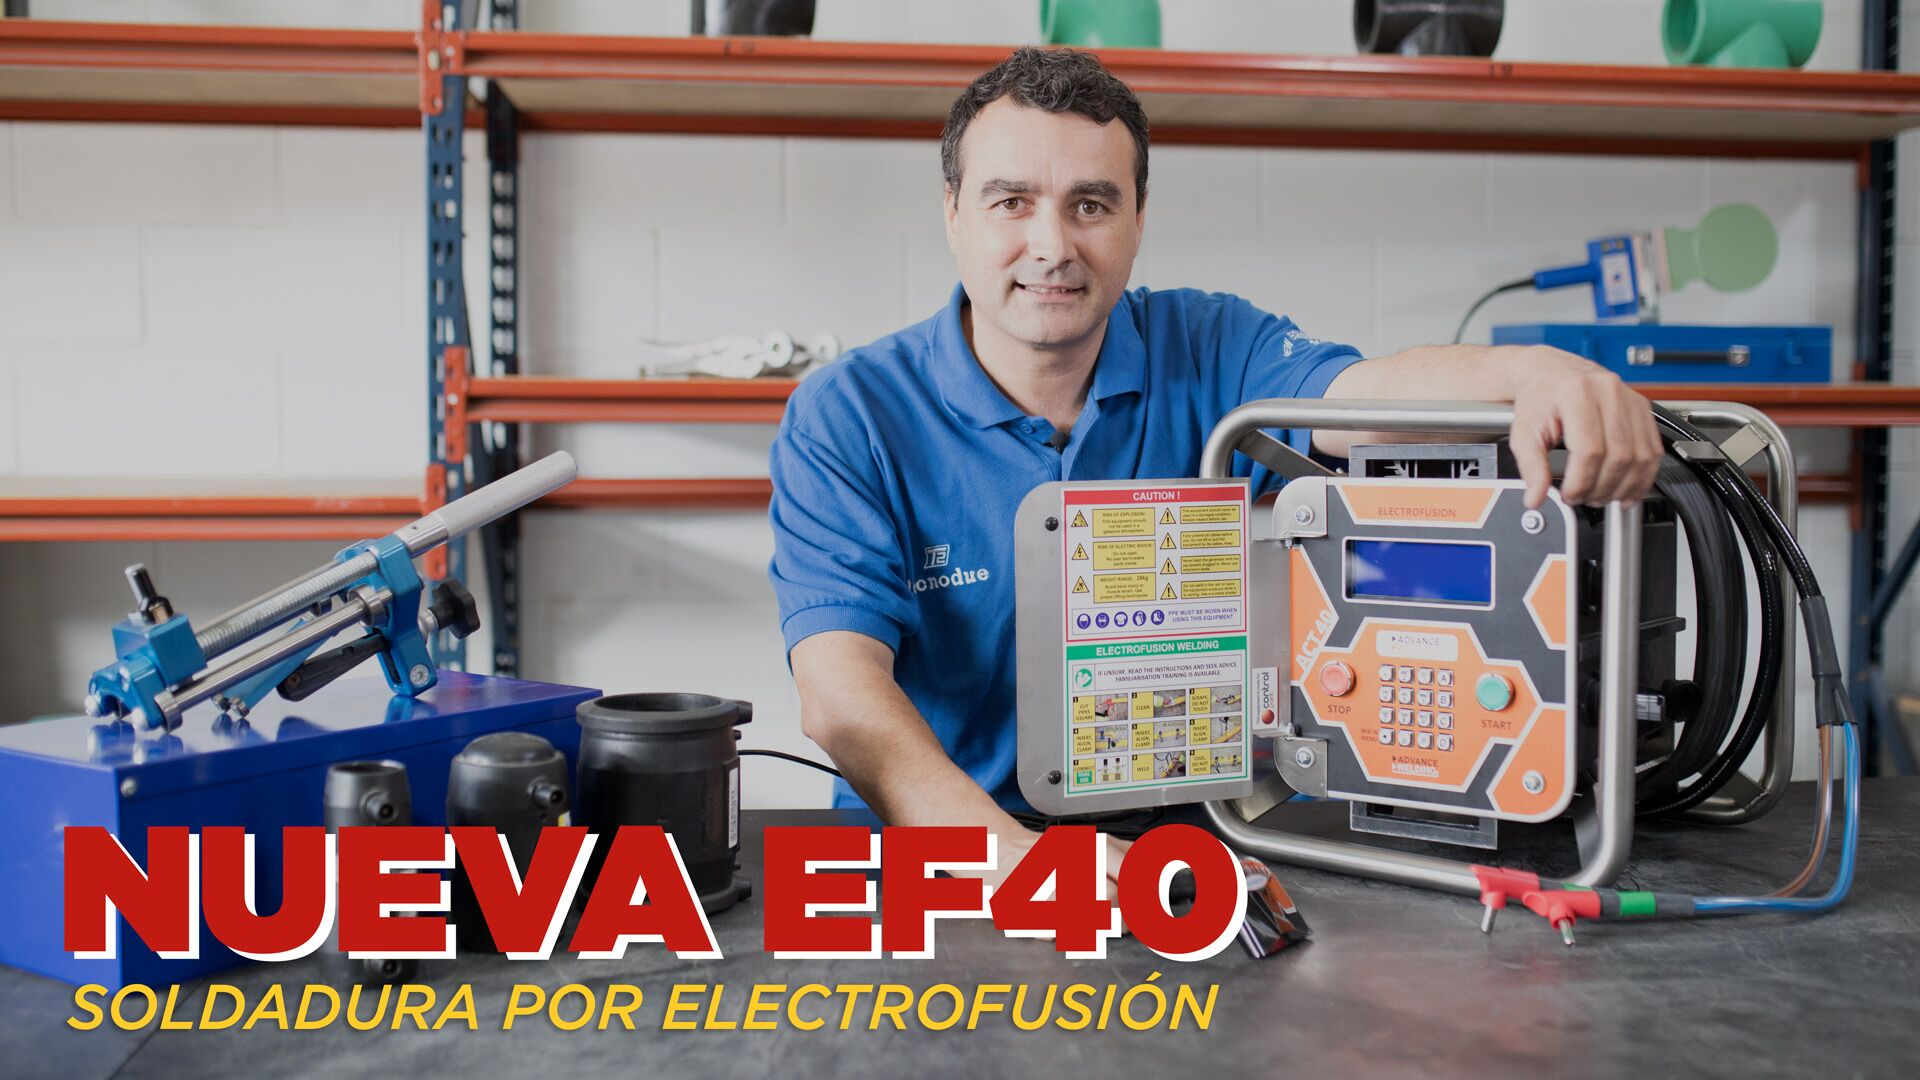 EF40 1